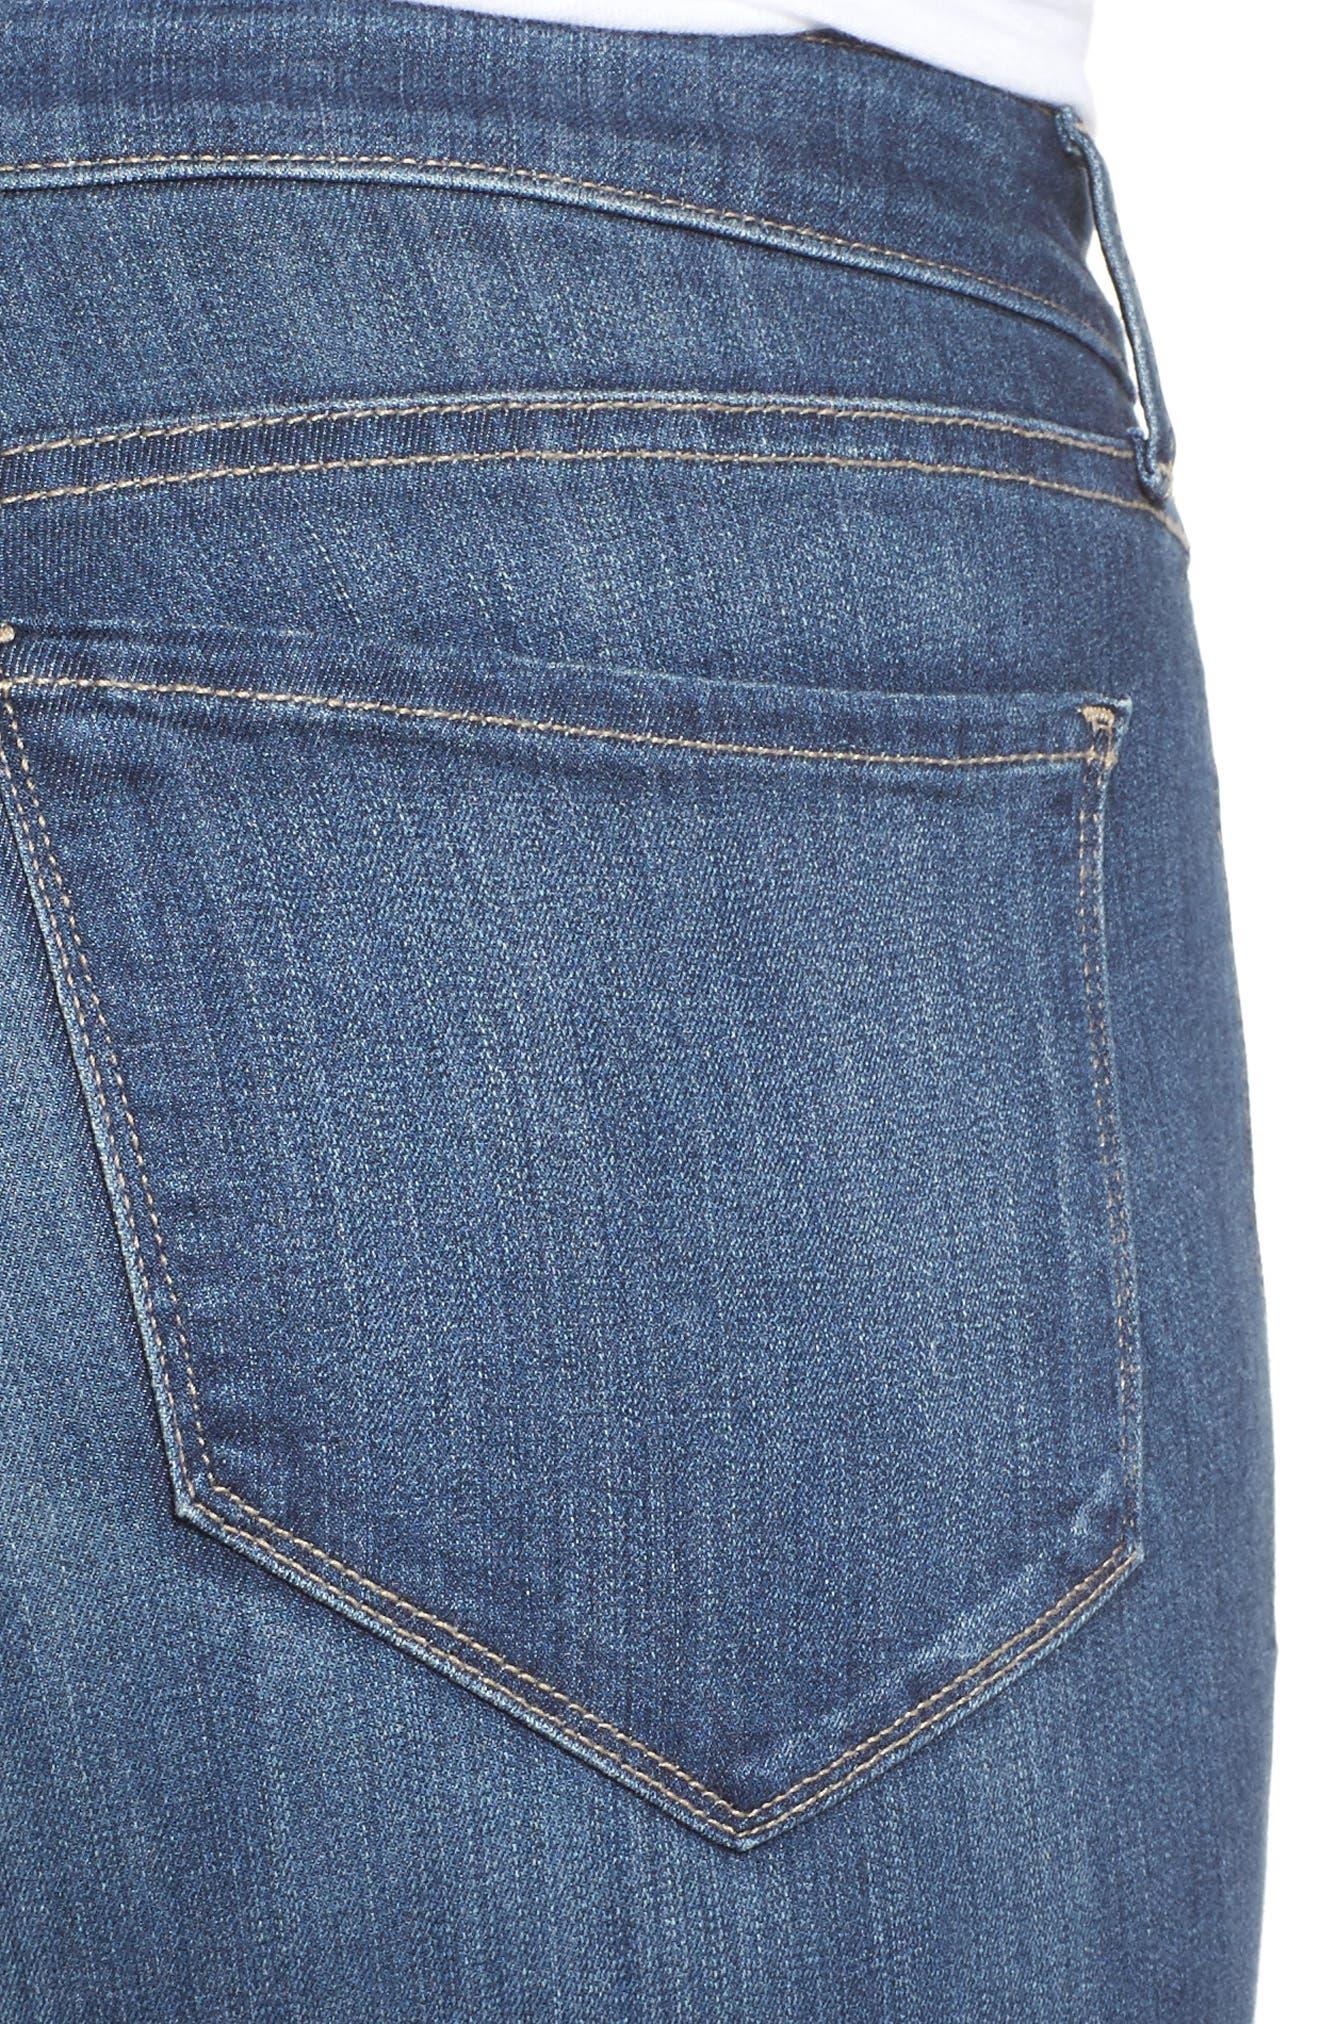 Alternate Image 4  - NYDJ Ami Release Hem Stretch Skinny Jeans (Plus Size)